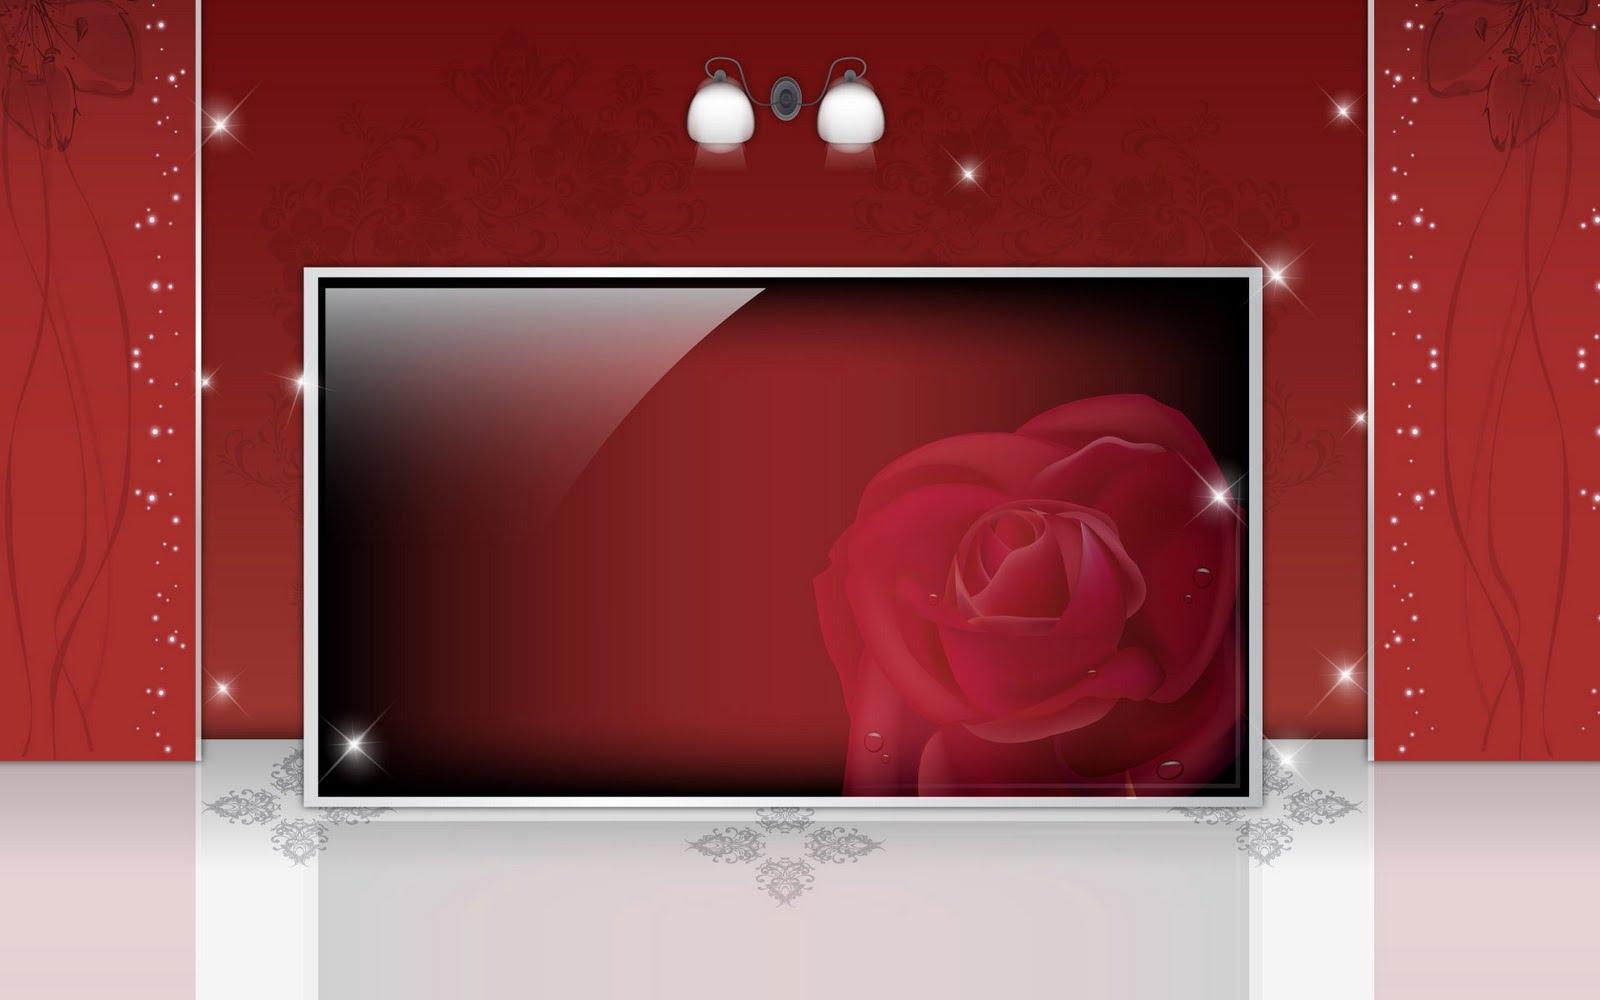 Wallpapers And Backgrounds Digital Art Interior Design HD Wallpaper 1600x1000